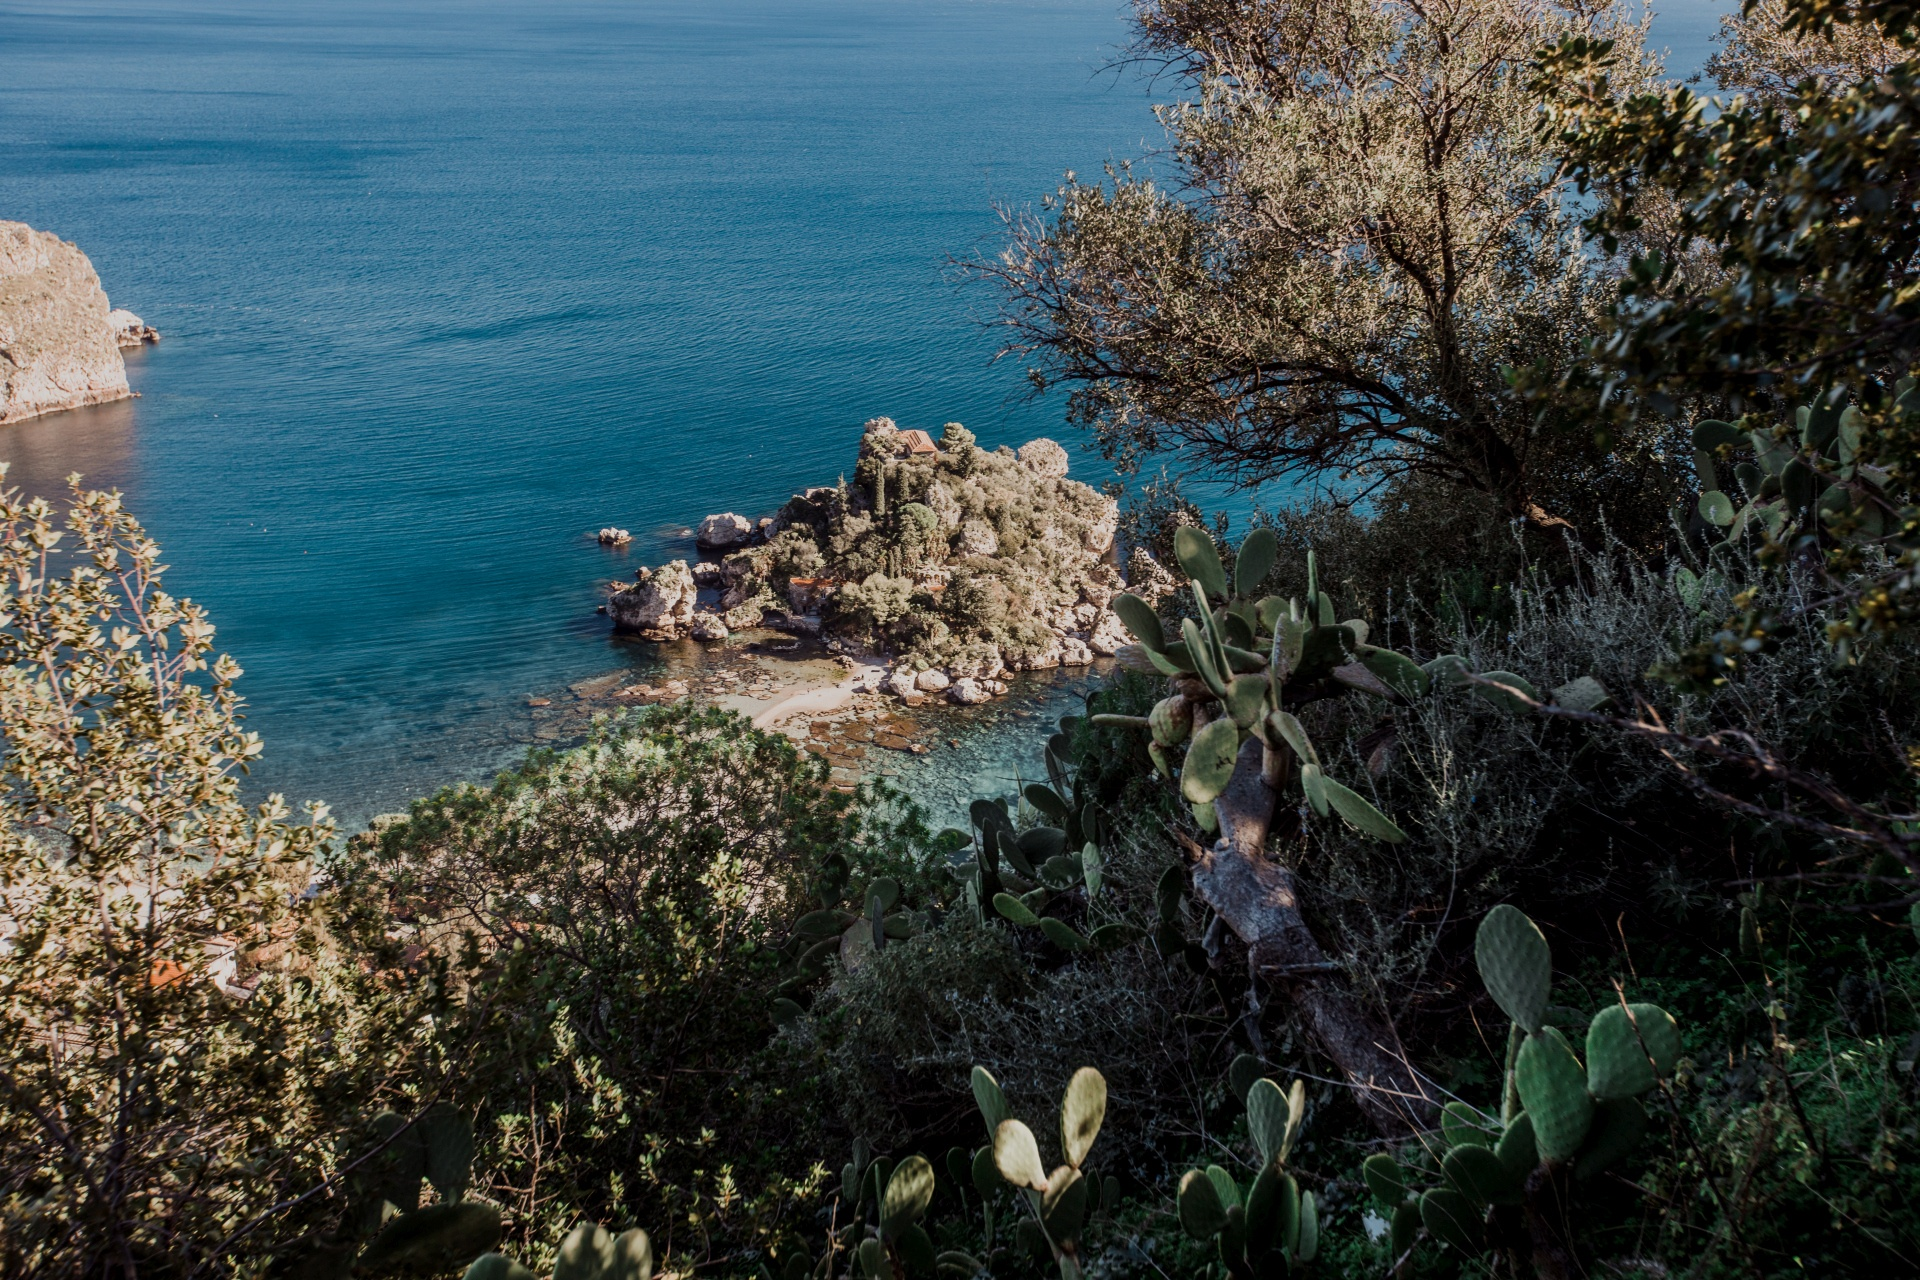 Miasteczko Taormina na Sycylii